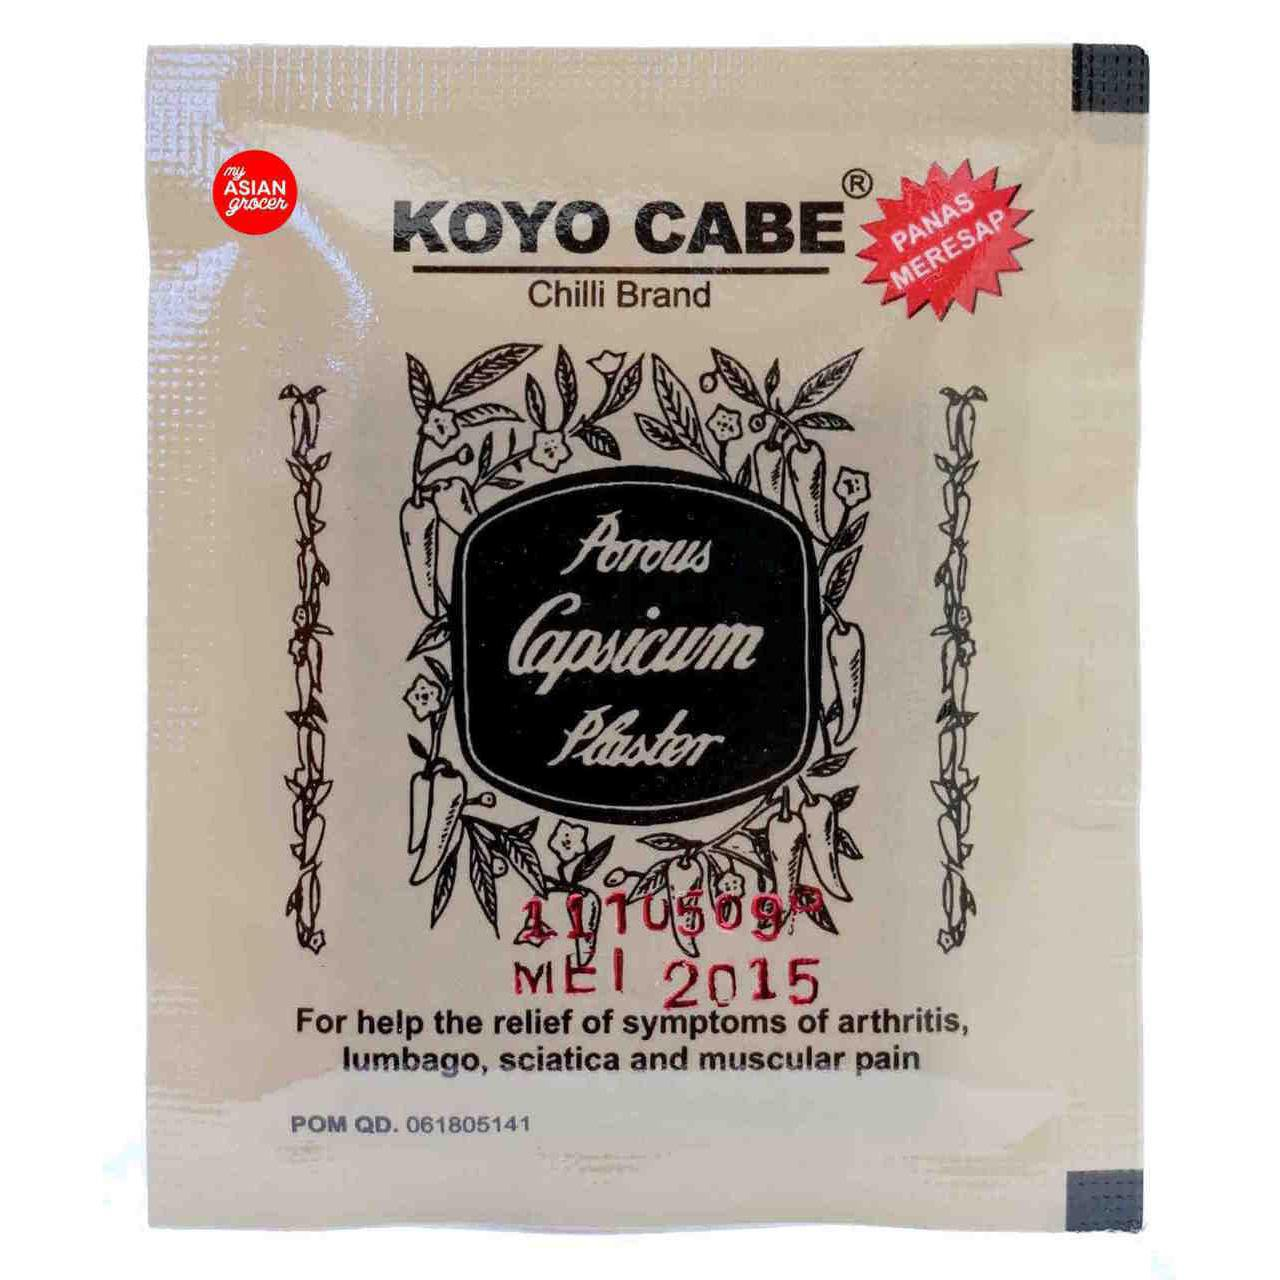 KOYO CABE 10 SACHET